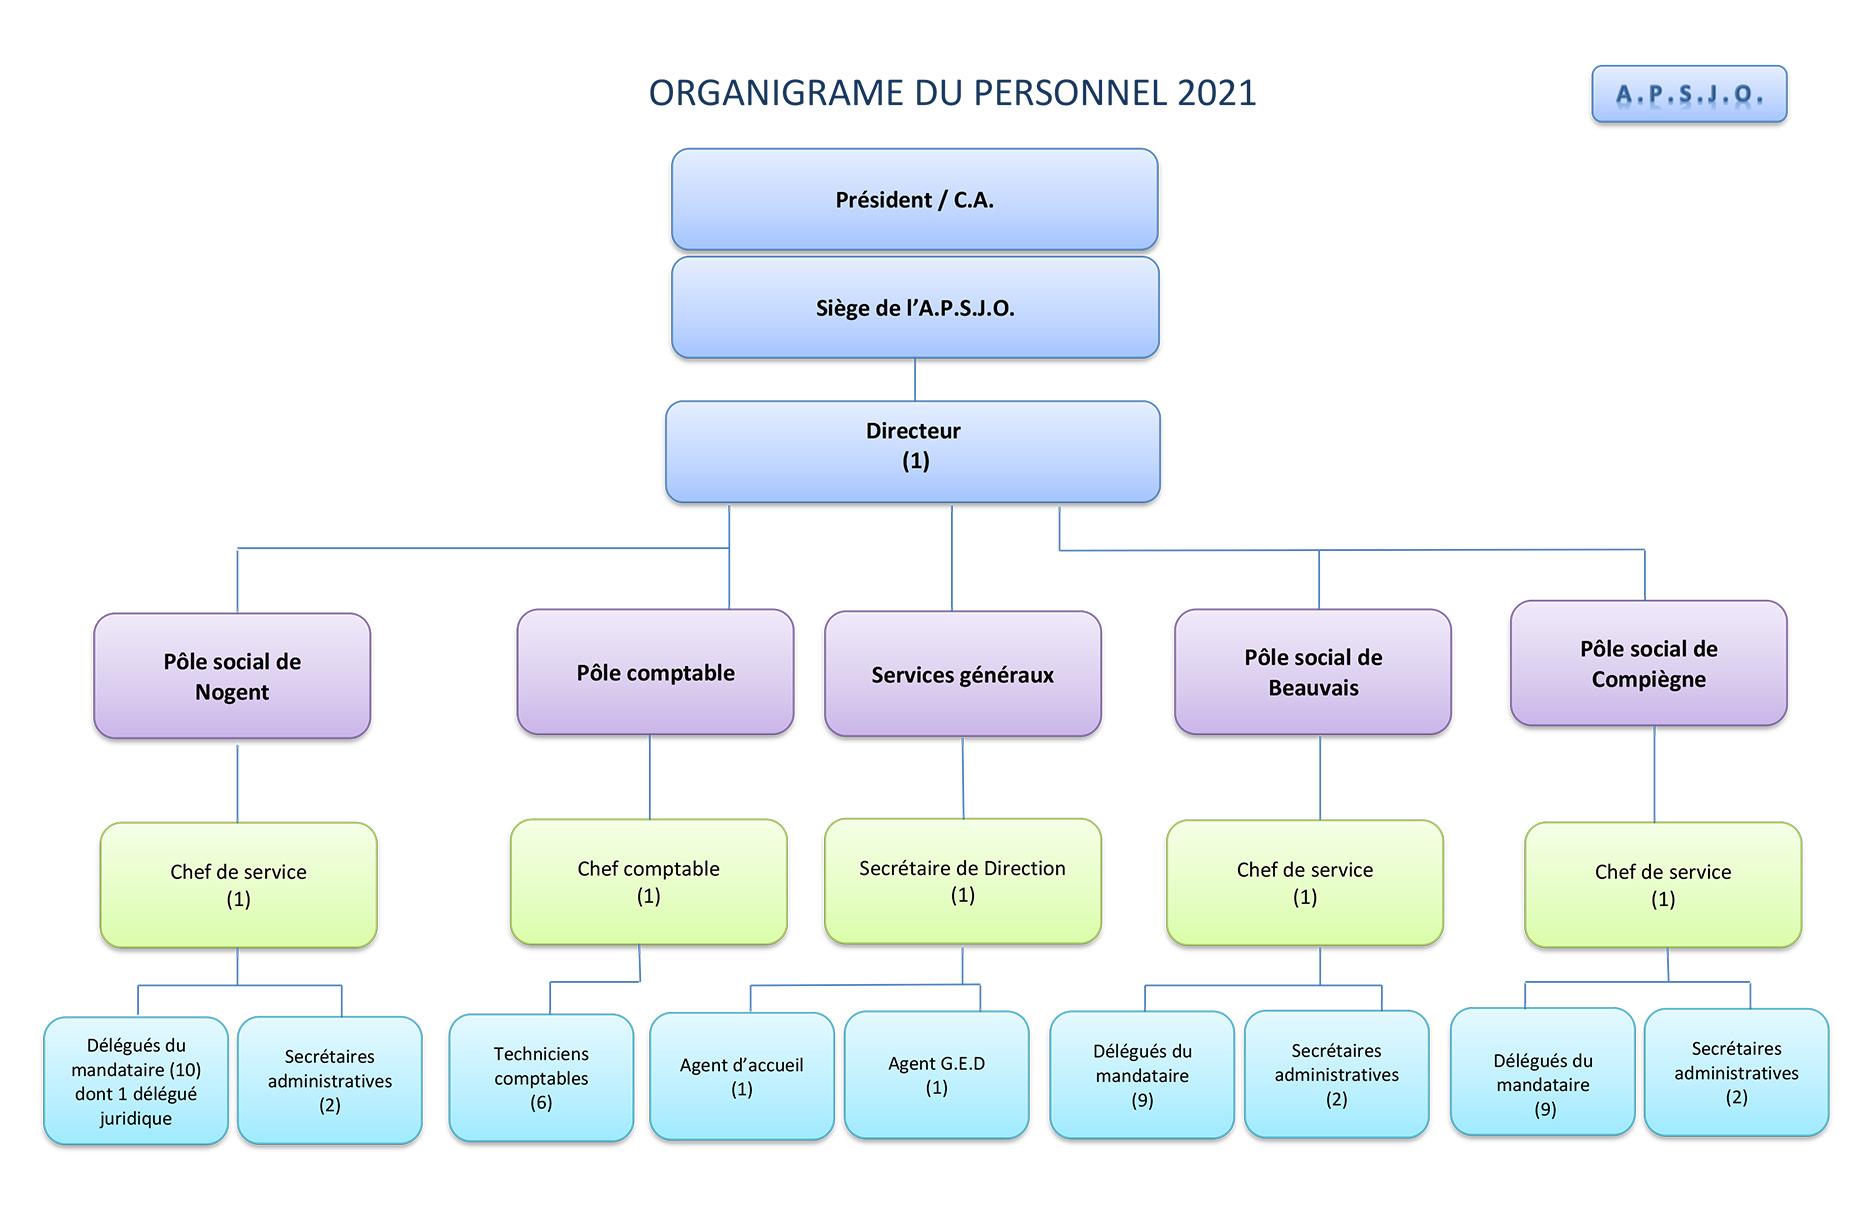 Organigramme-du-personnel-2021-22.06